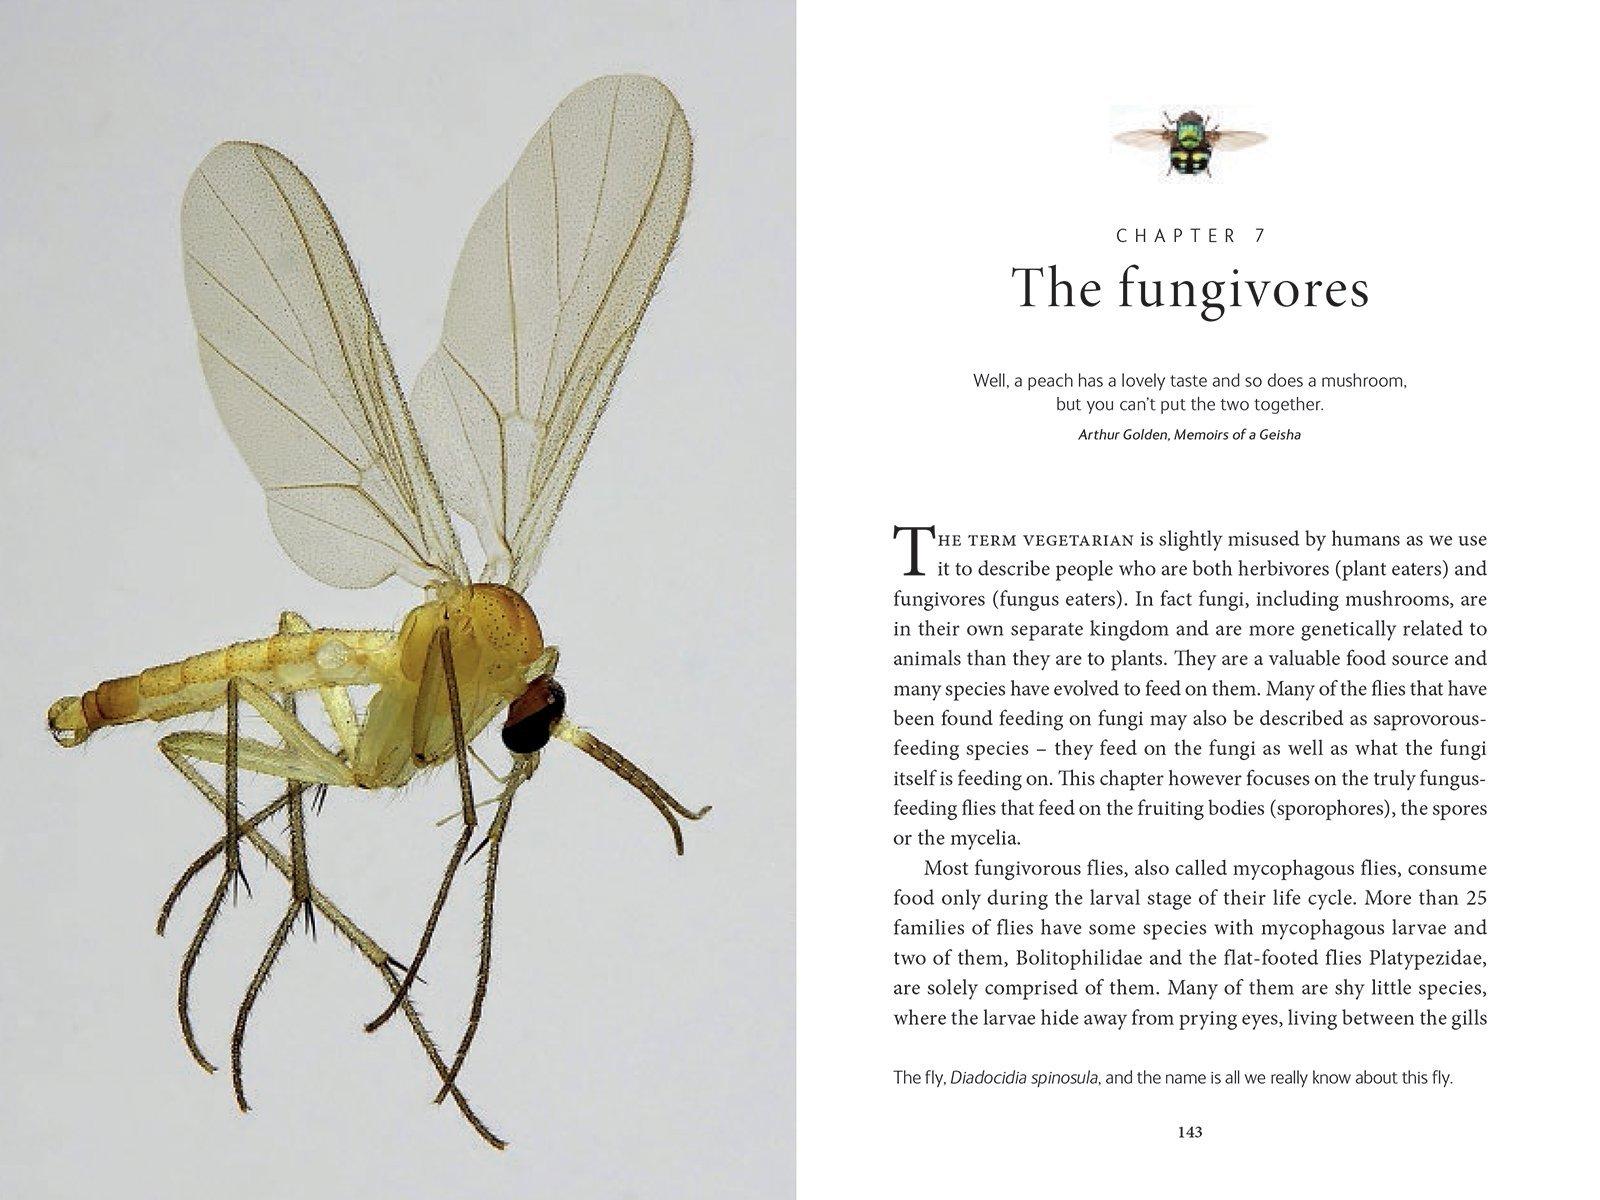 the secret life of flies erica mcalister 9781770858091 amazon